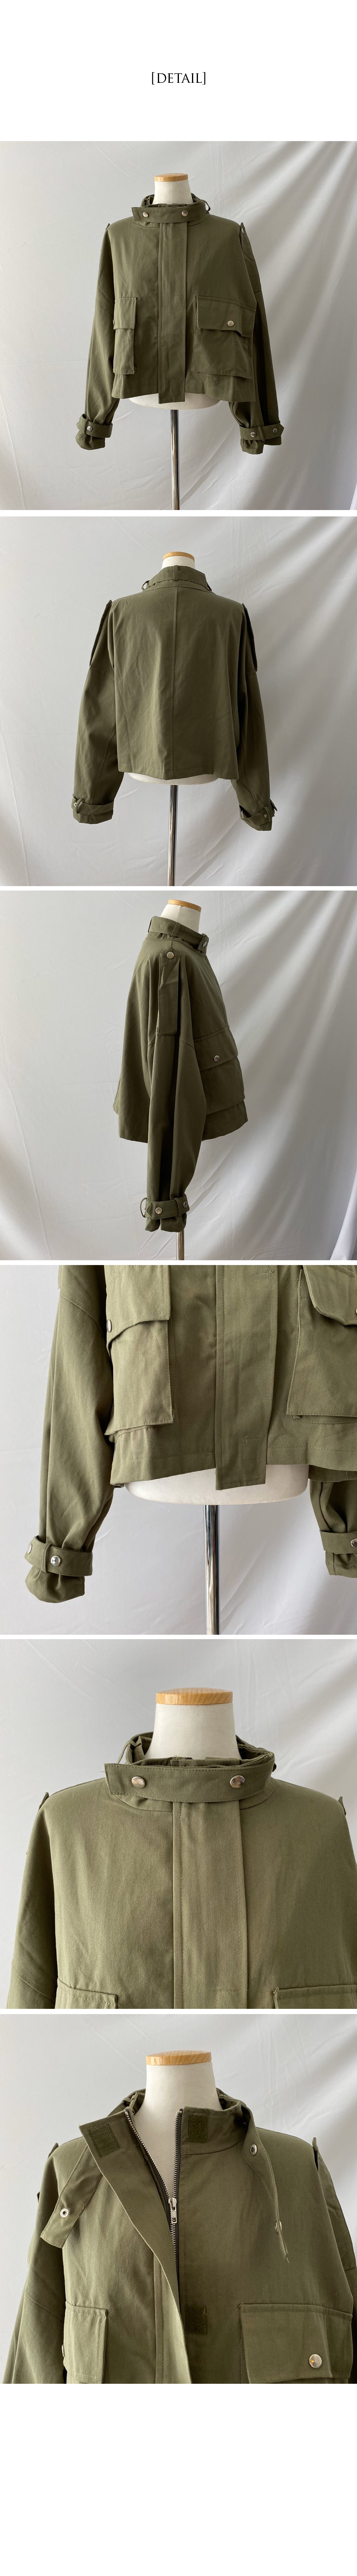 Strap cargo field short jacket